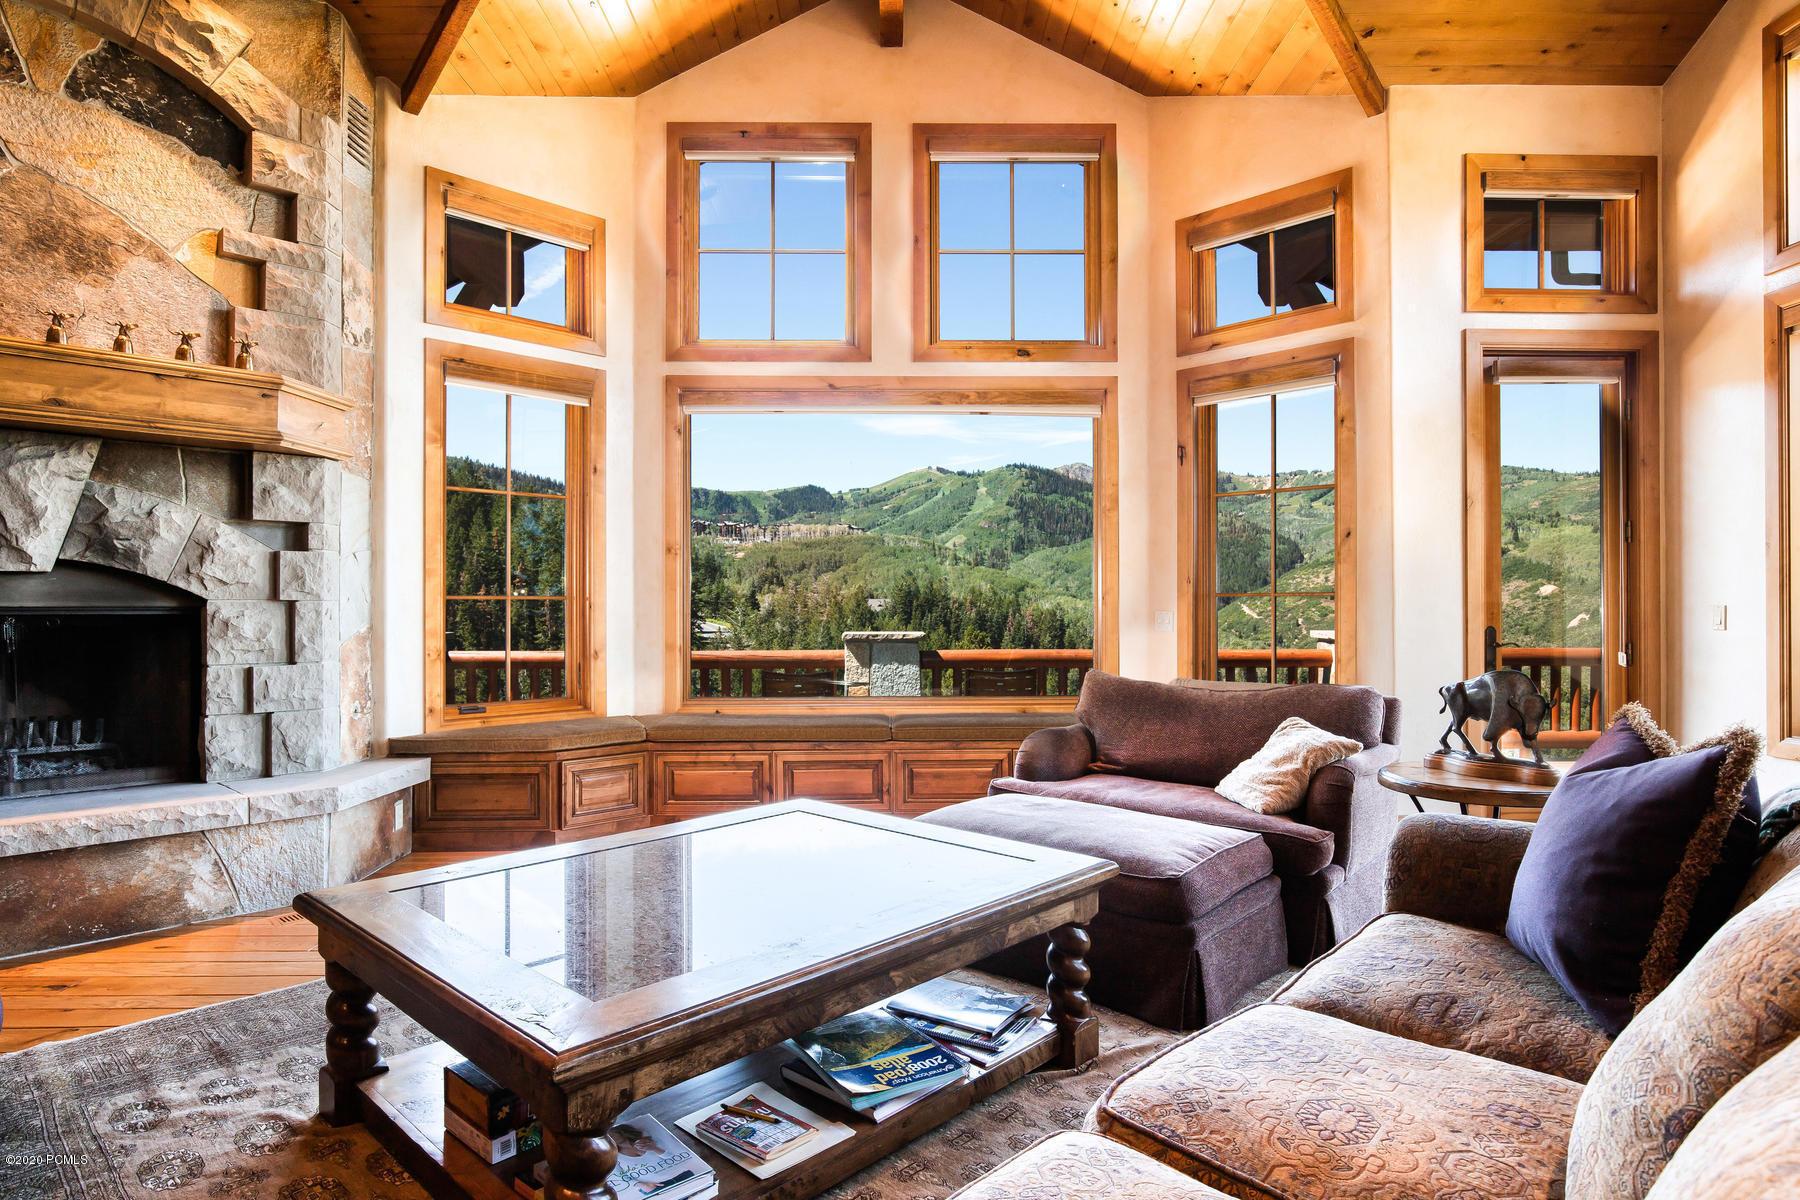 21 Silver Dollar Road, Park City, Utah 84060, 5 Bedrooms Bedrooms, ,6 BathroomsBathrooms,Single Family,For Sale,Silver Dollar,20190109112430415765000000